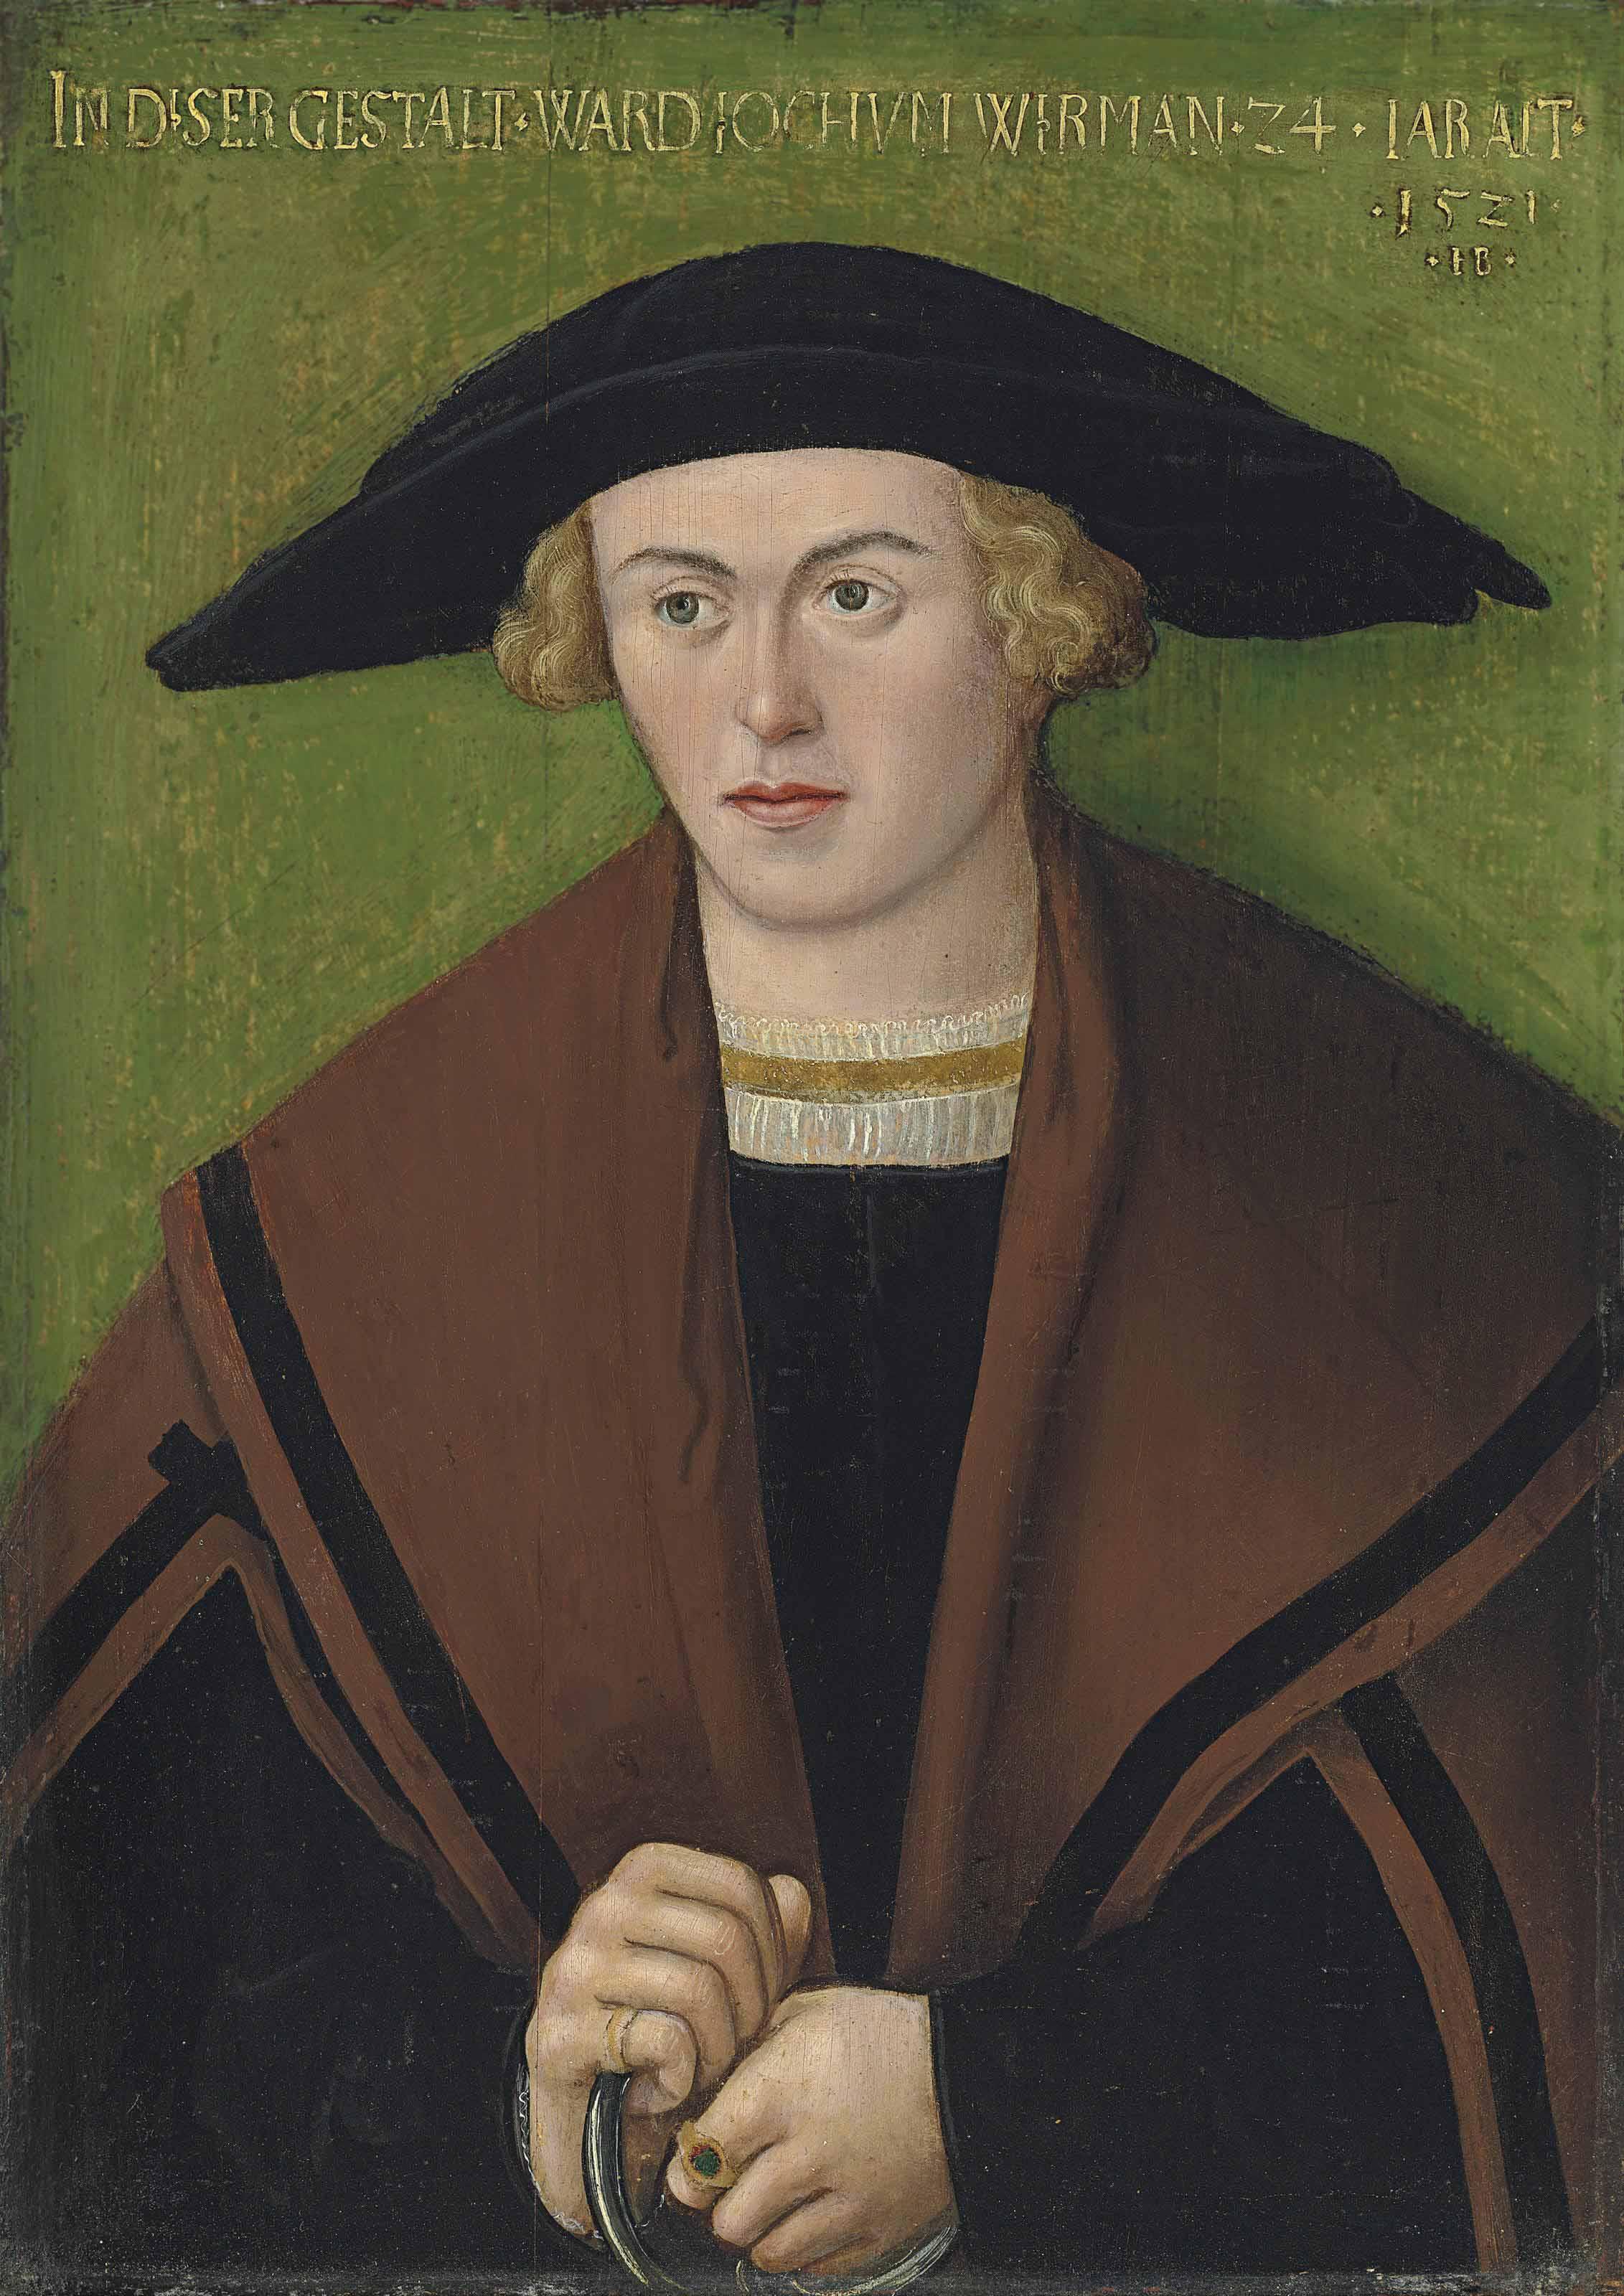 Portrait of Jochum Wirman, half-length, in black robes and a brown cloak, wearing a hat